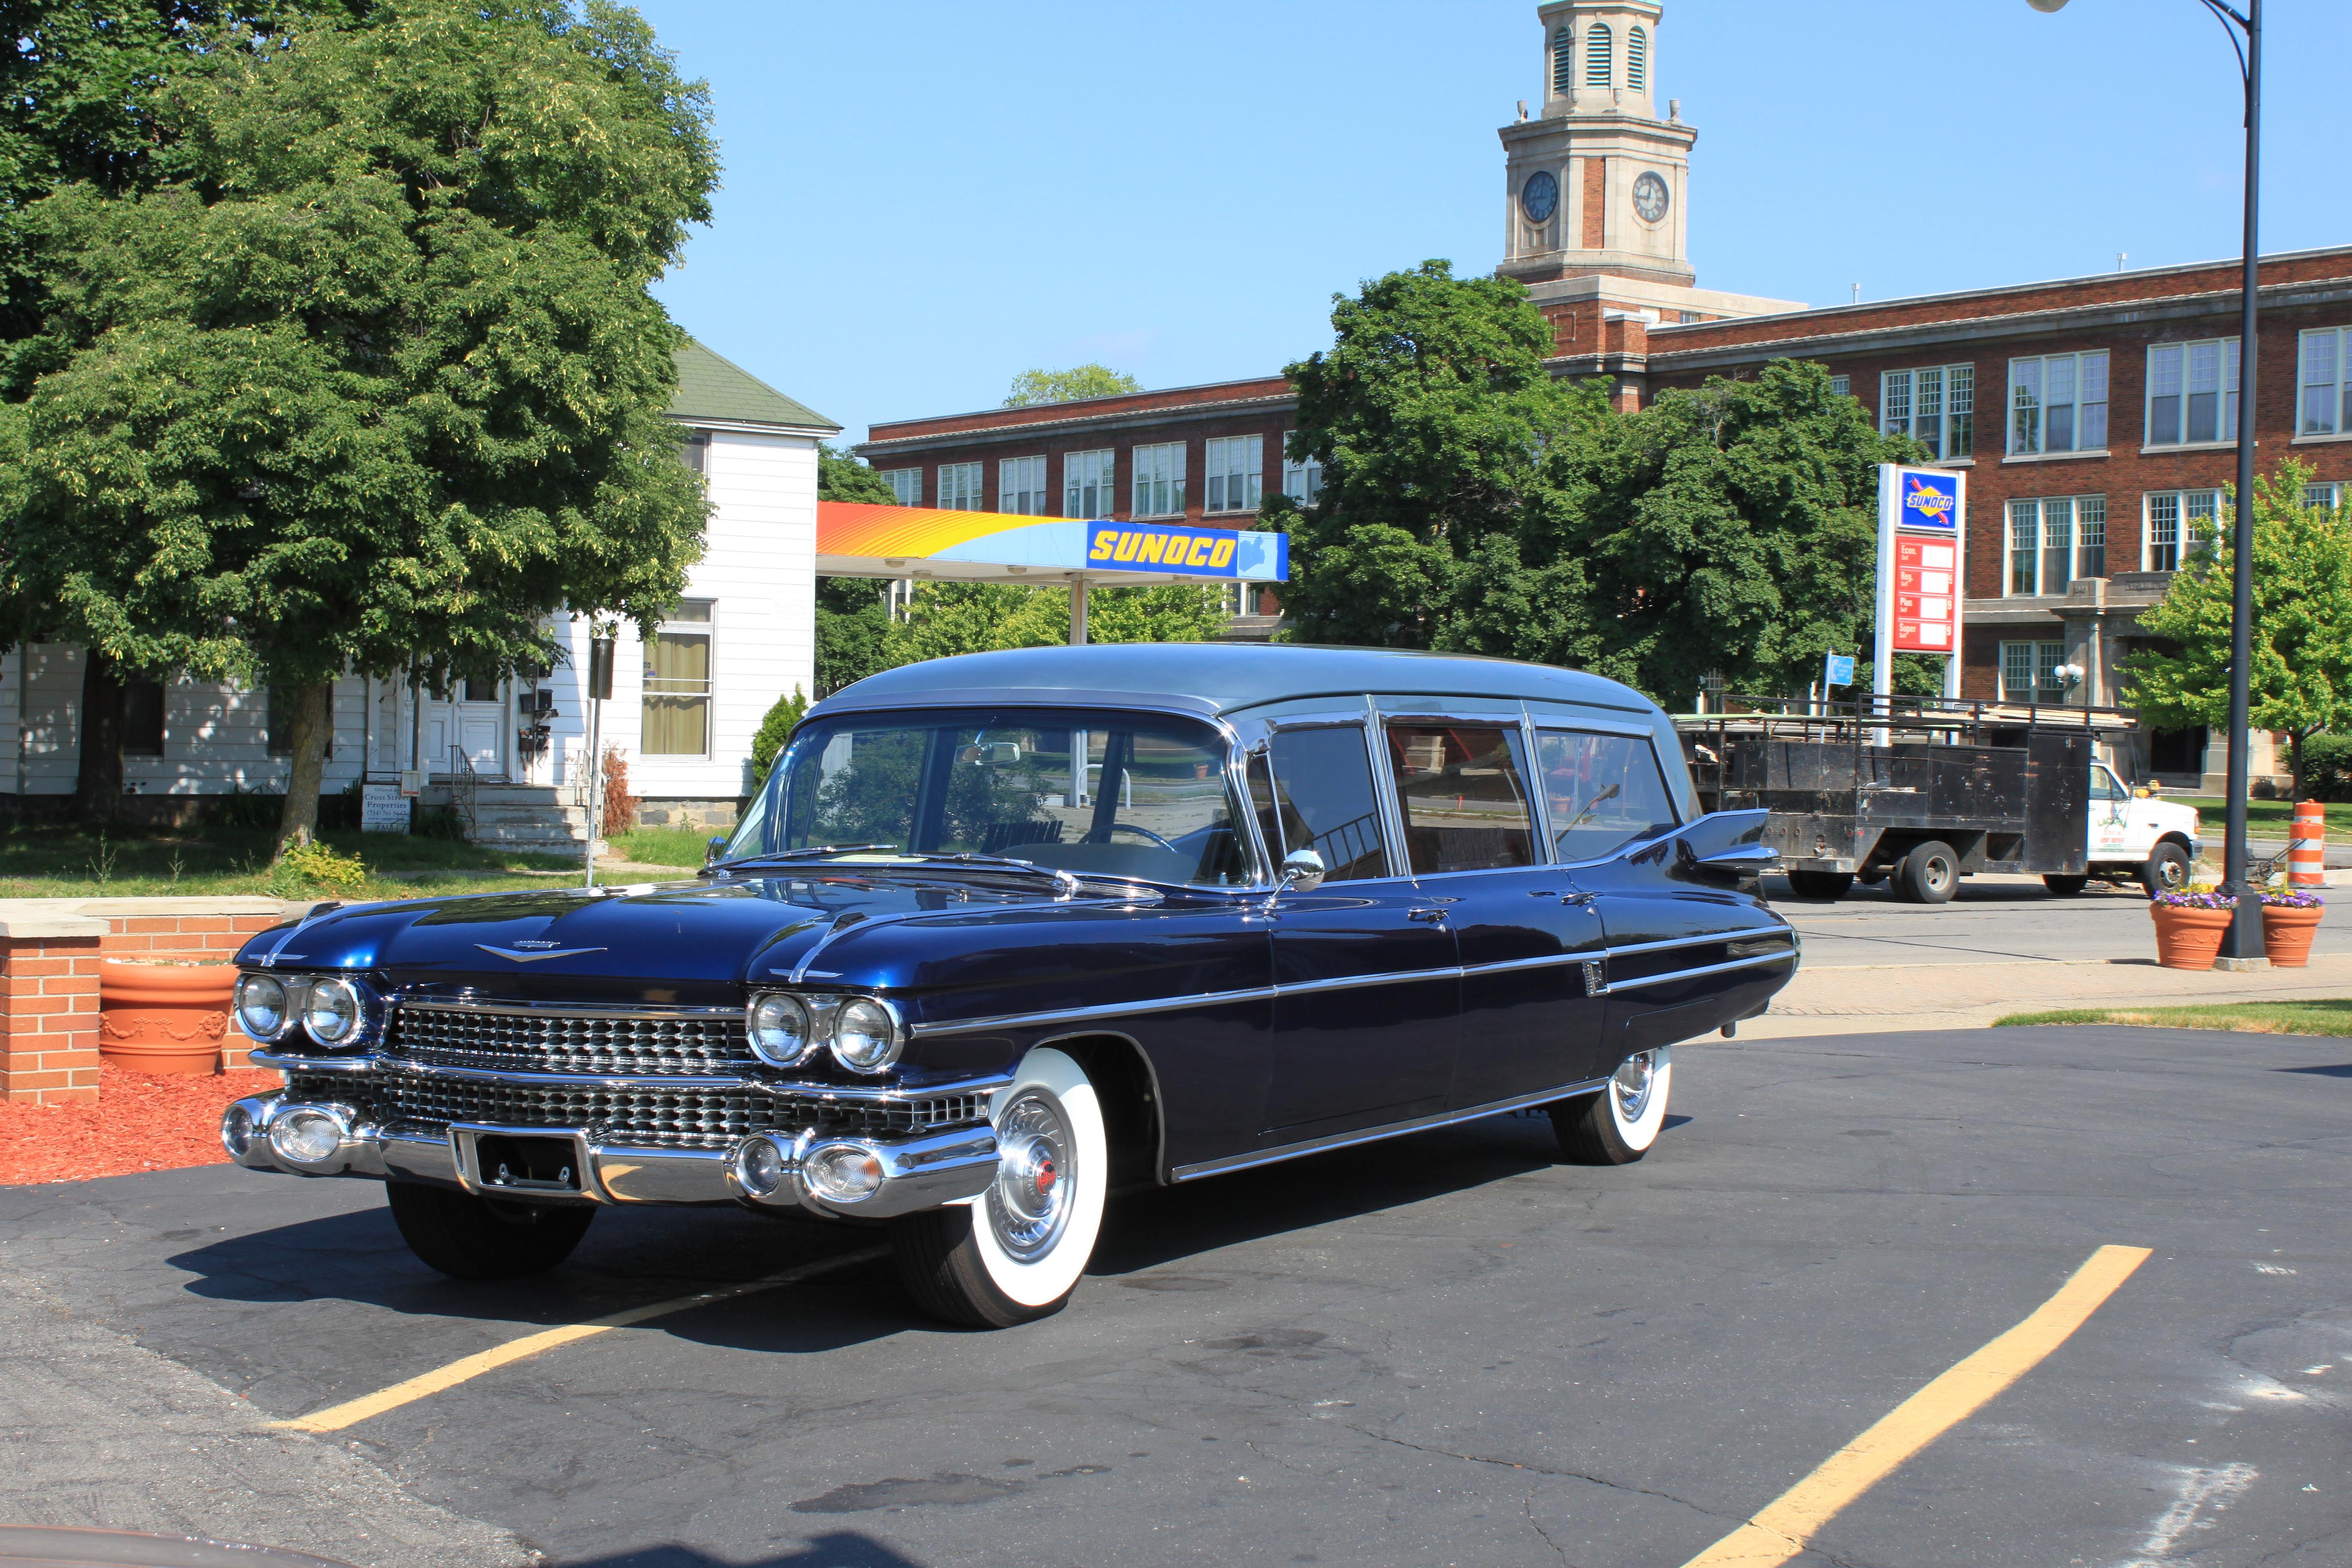 File:1959 Cadillac hearse Janowiak funeral home Ypsilanti Michigan.JPG - Wikimedia Commons